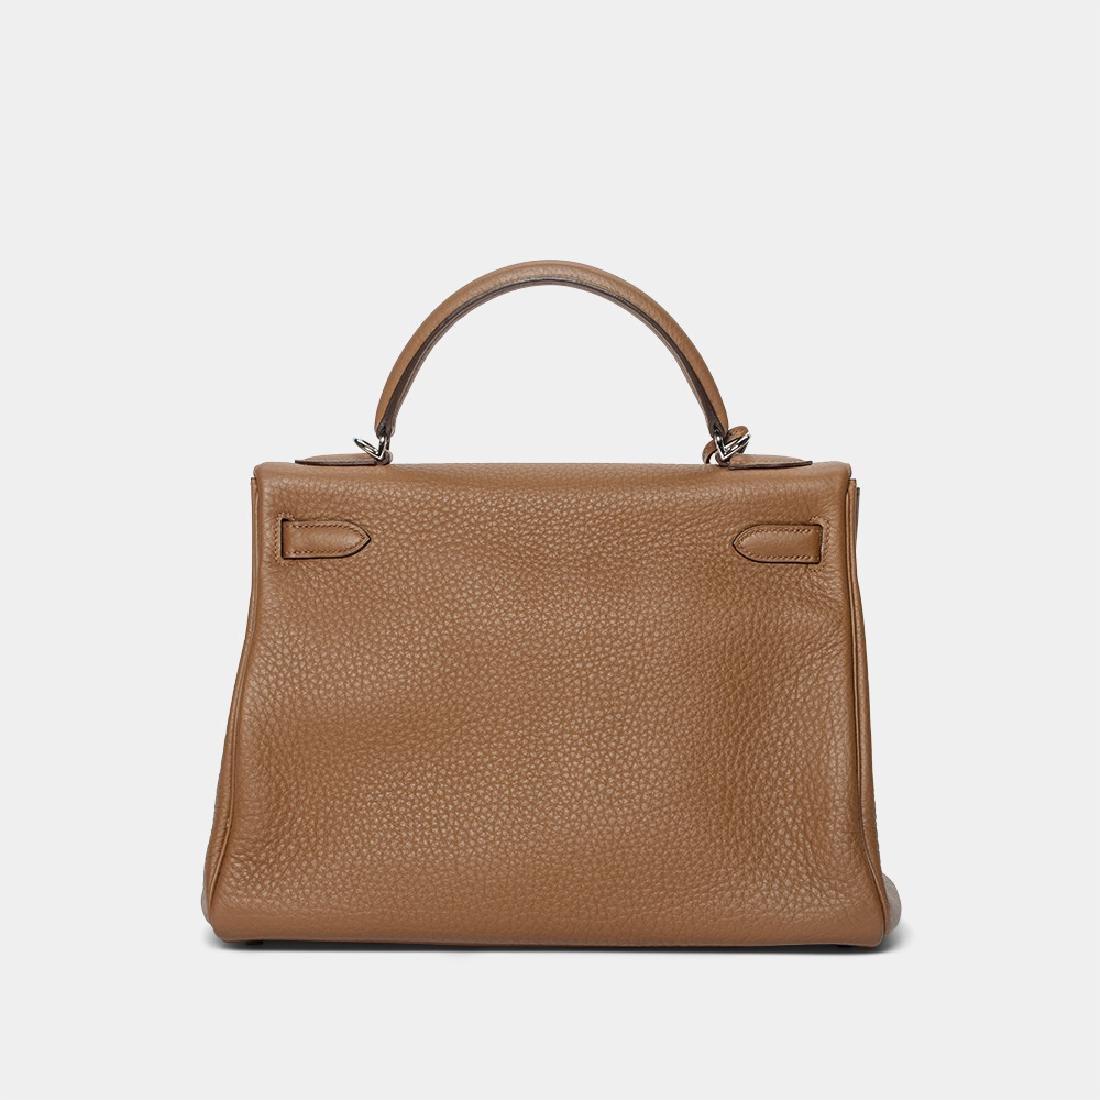 "HERMÈS beliebte Stil-Ikonen Handtasche ""RETOURNE KELLY - 4"